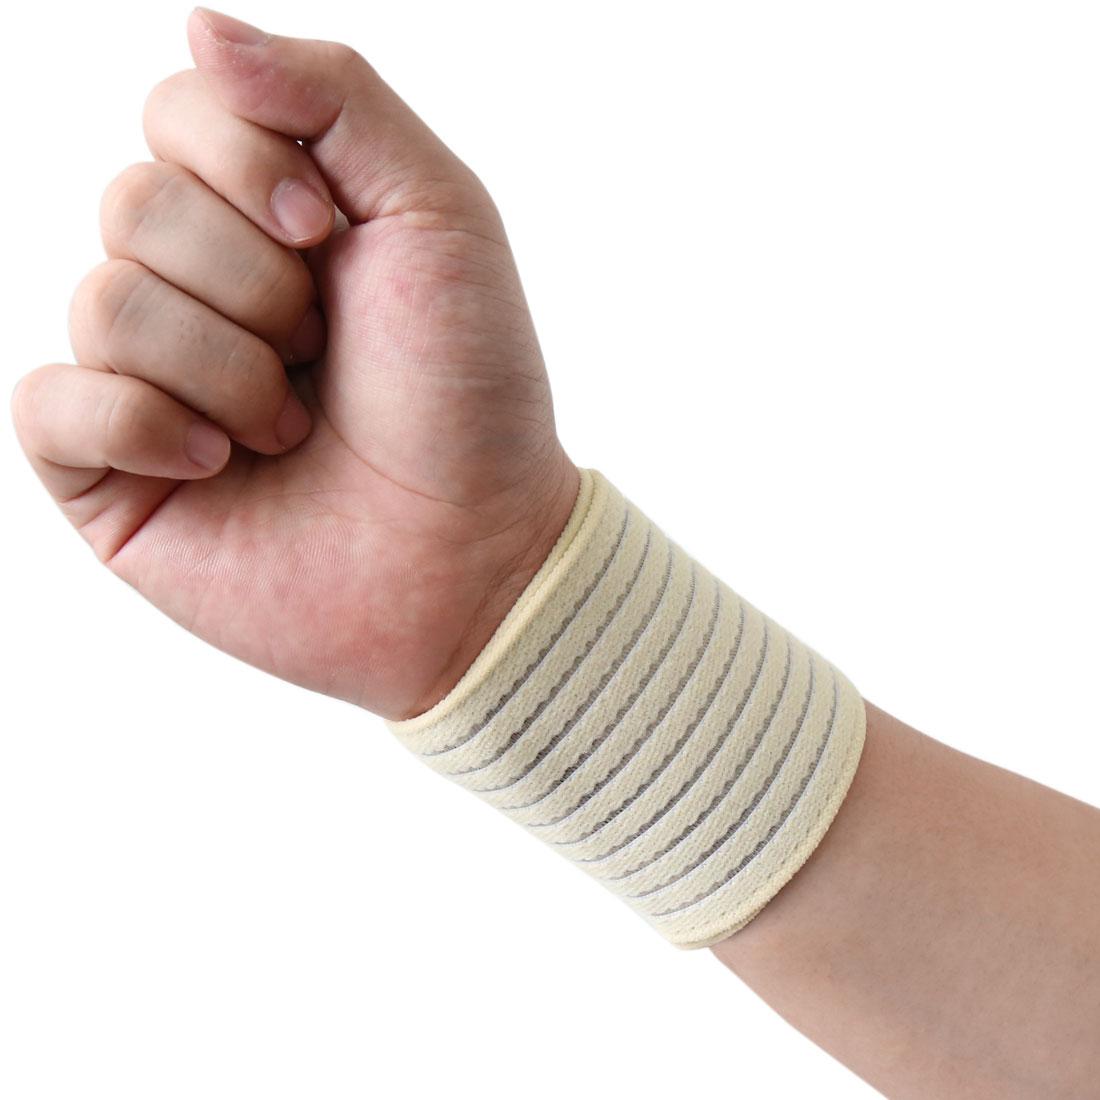 Beige Elastic Sports Wrist Brace Band Hand Palm Wrap Bandage Guard Supporter